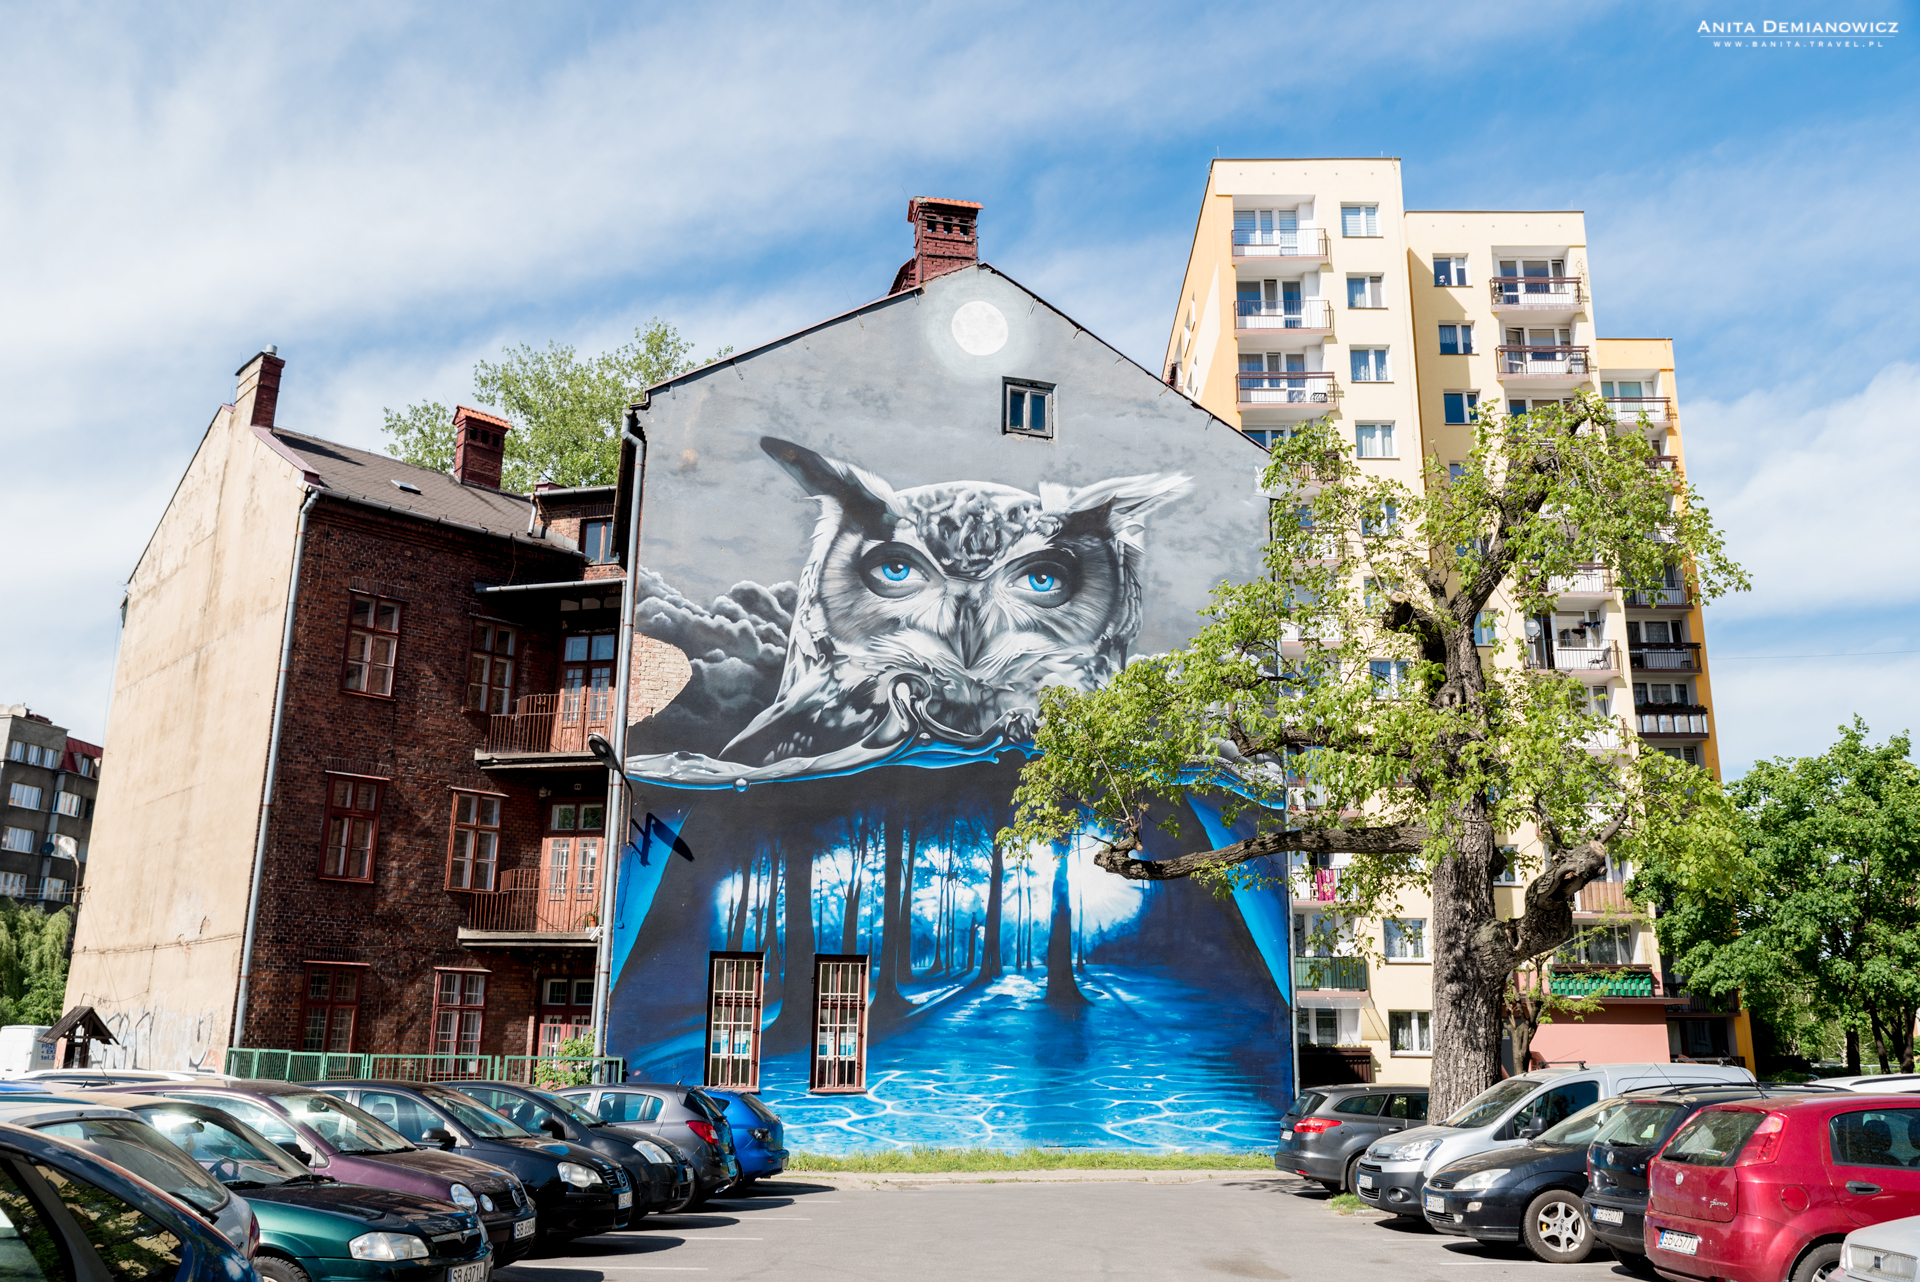 Mural-sowa,-Bielsko-Biała